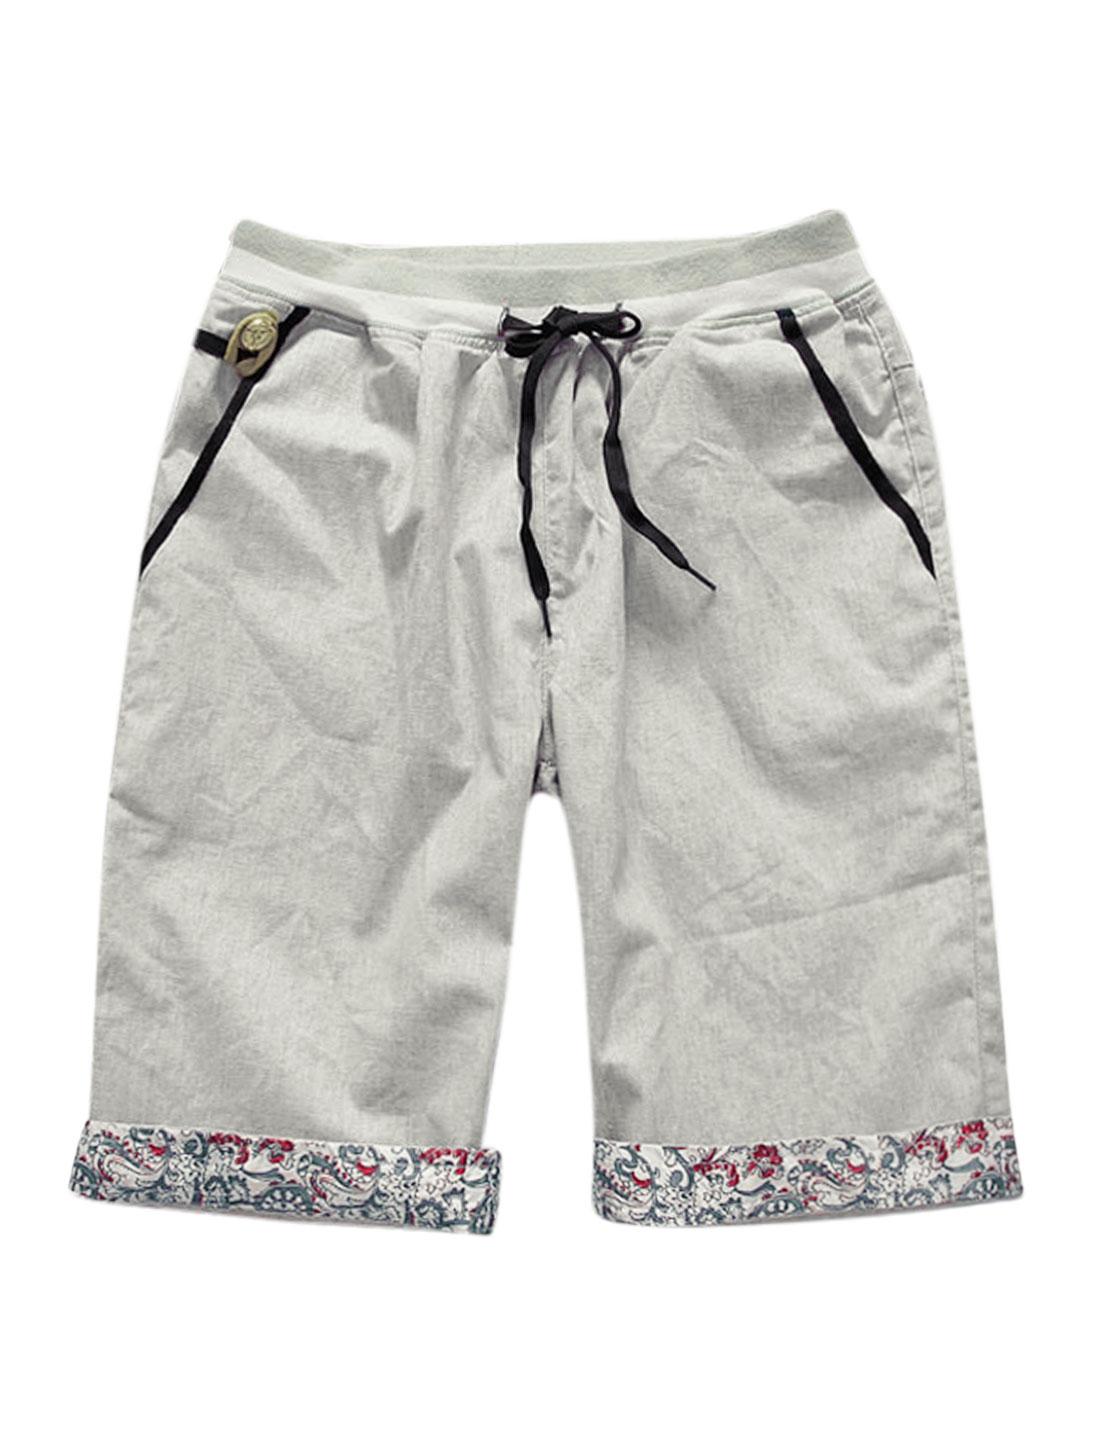 Man Button Decor Straight Leg Mid Rise Casual Shorts Light Gray W32